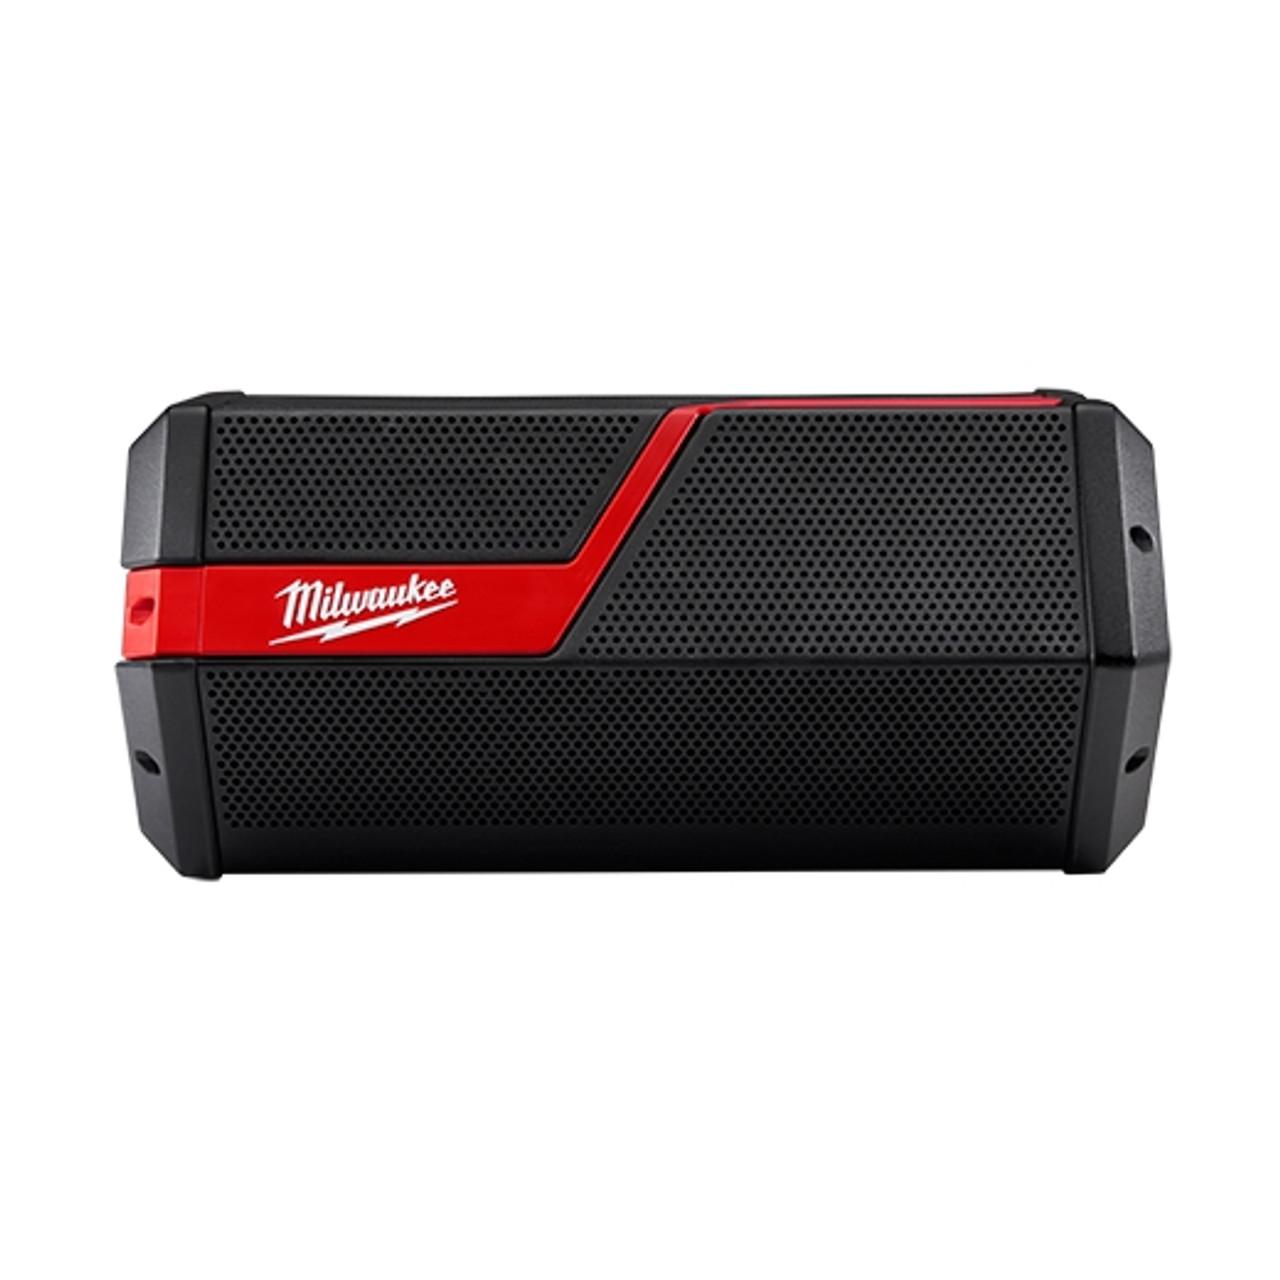 Milwaukee 2891-20 M18/M12 Wireless Jobsite Speaker